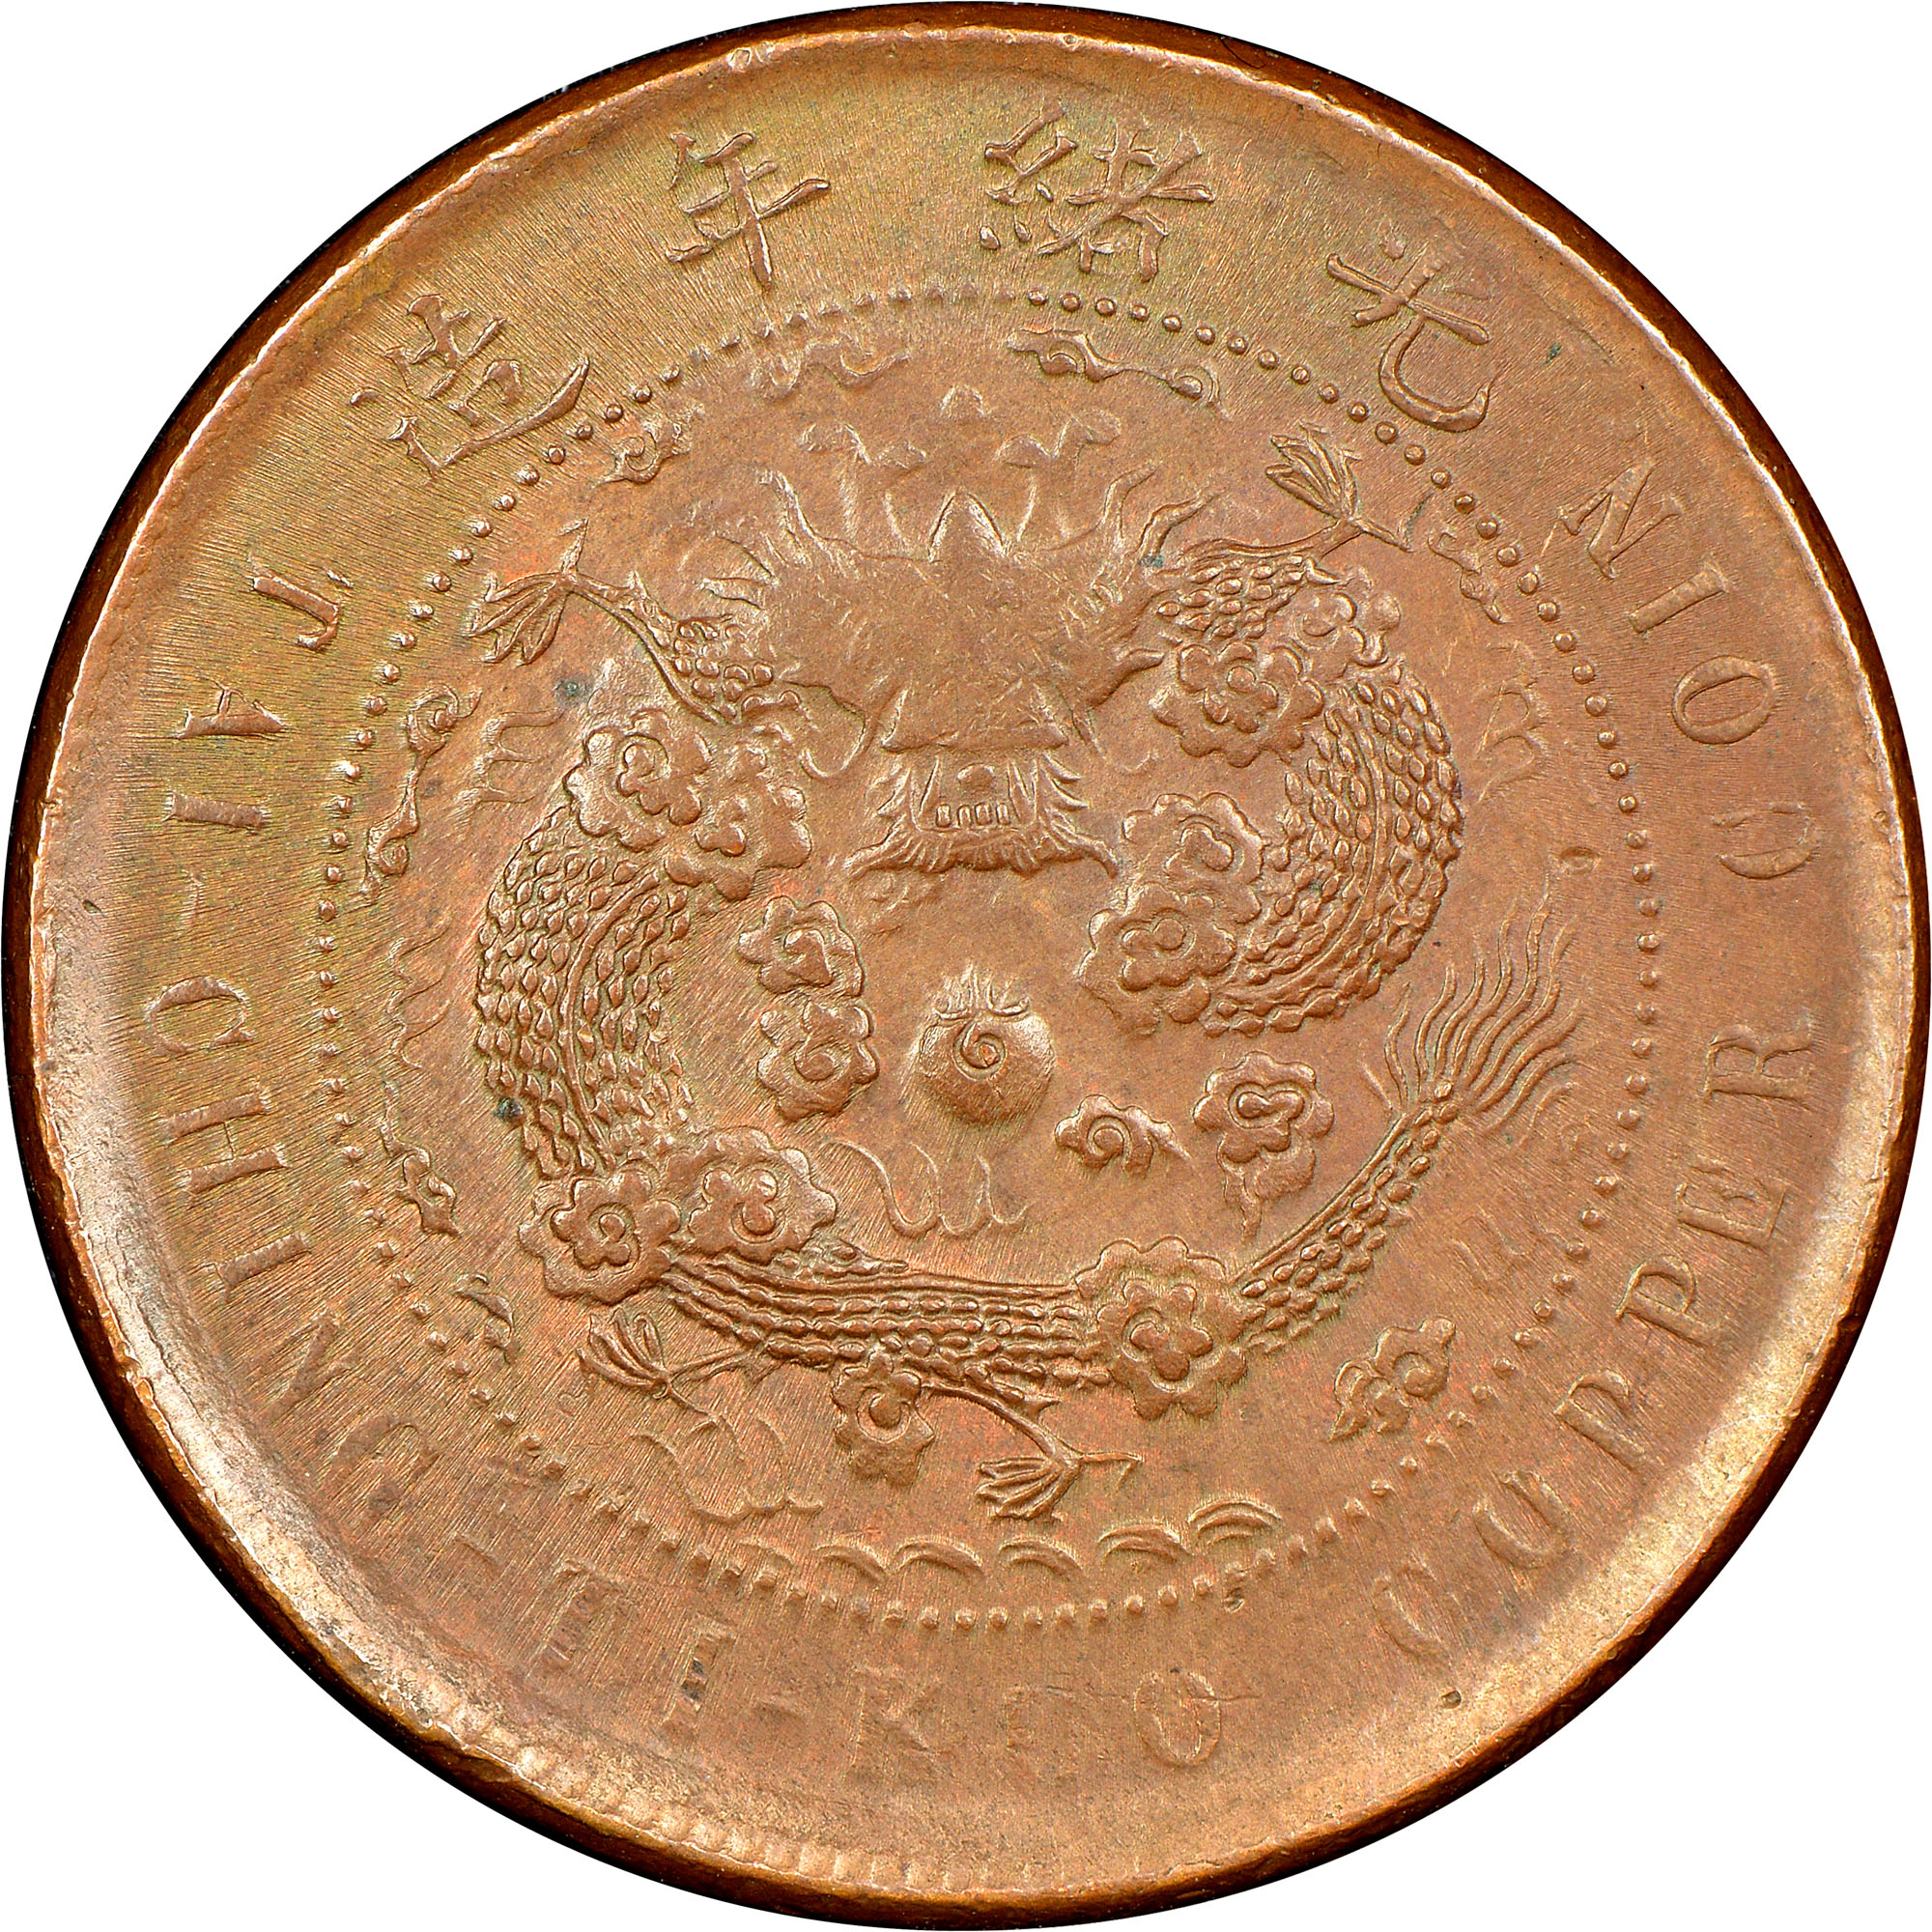 1905 China EMPIRE 10 Cash reverse